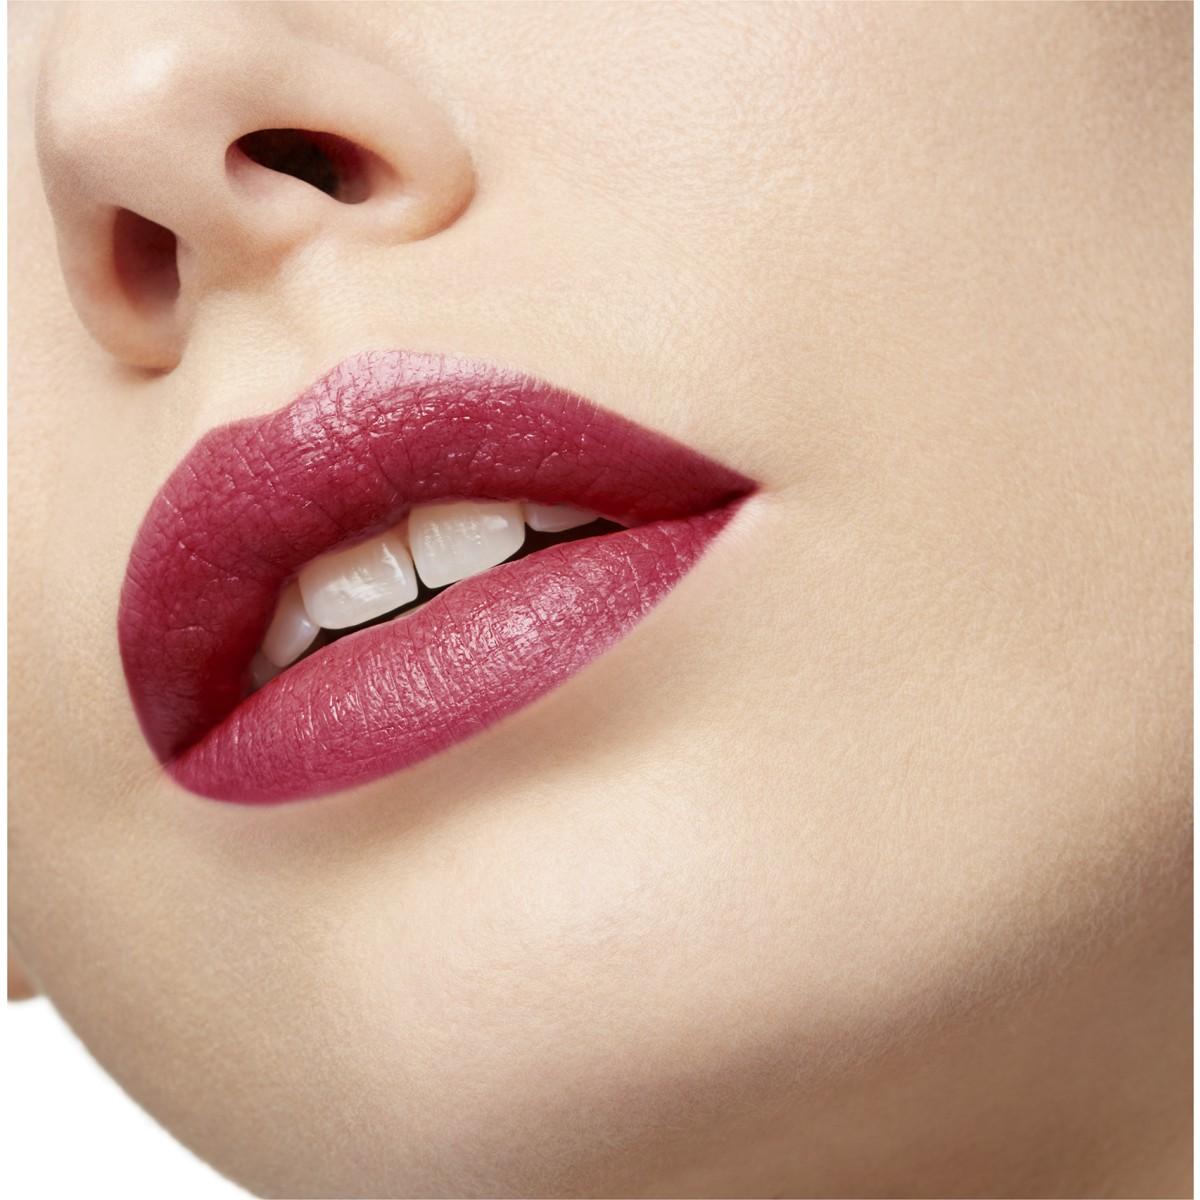 Woman Beauty - リップカラー ユーユー 415s - Christian Louboutin